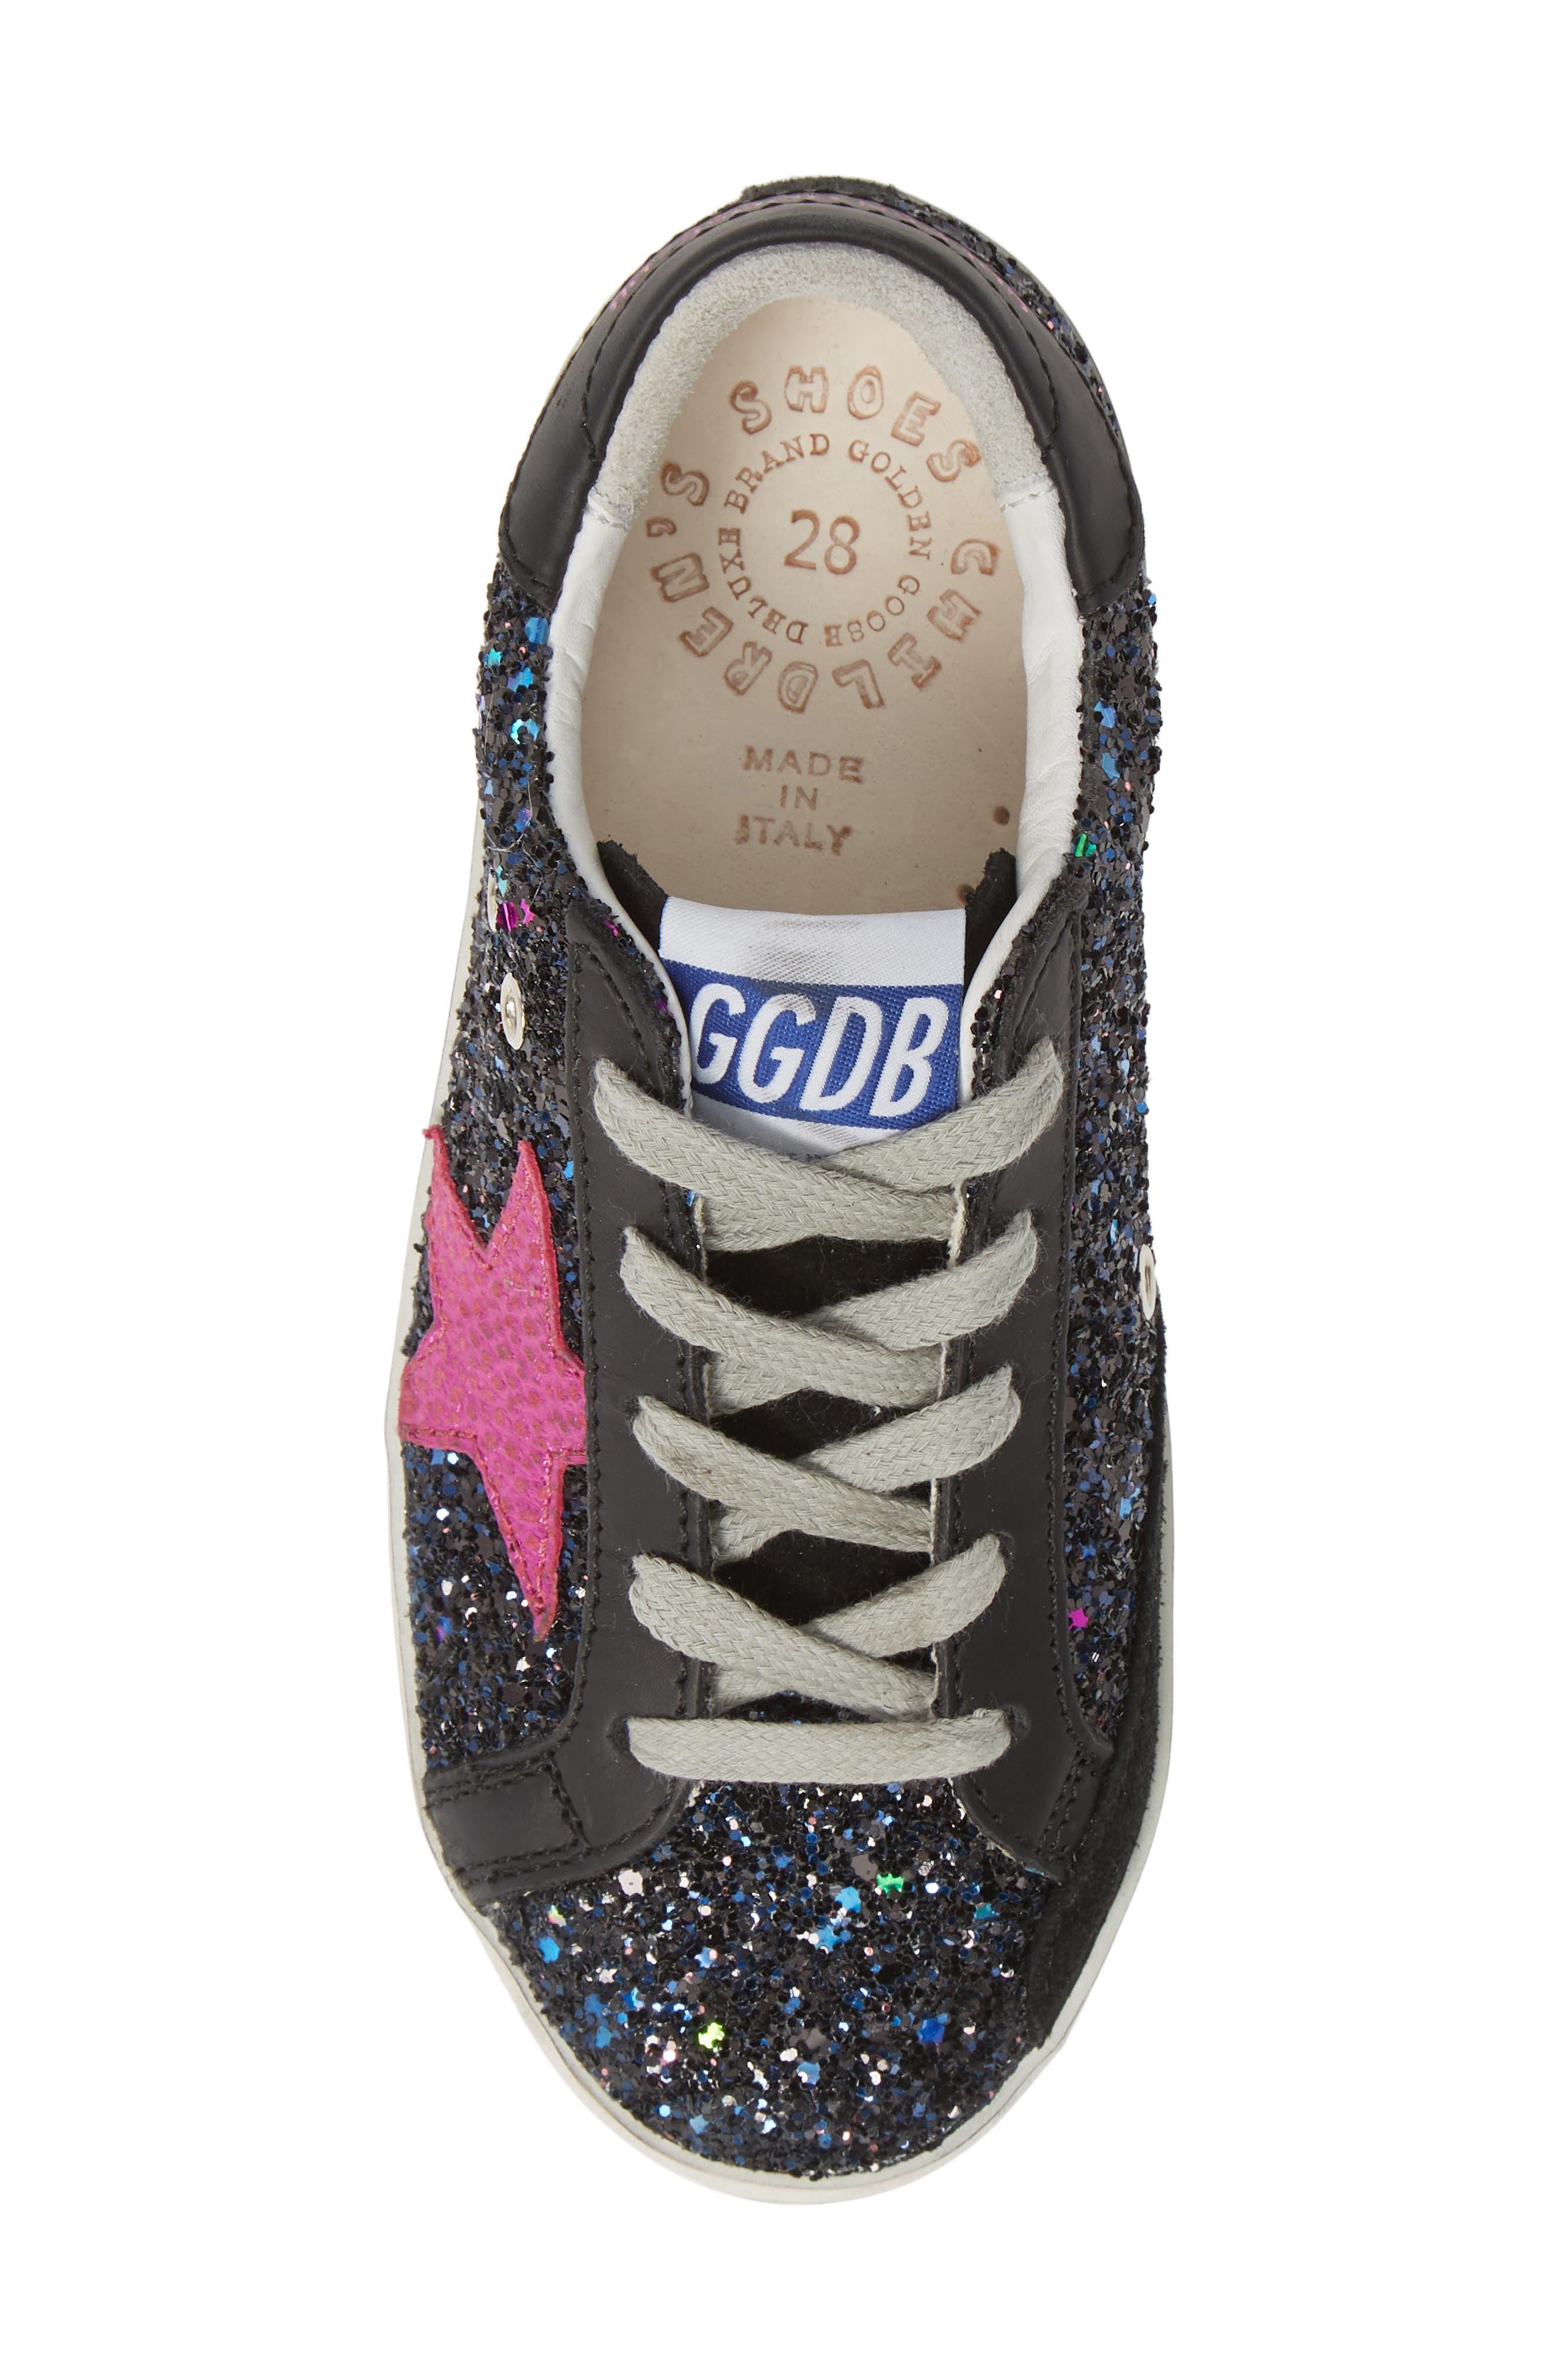 GOLDEN GOOSE,                             Superstar Glitter Low Top Sneaker,                             Alternate thumbnail 5, color,                             GALAXY GLITTER/ FUCHSIA STAR